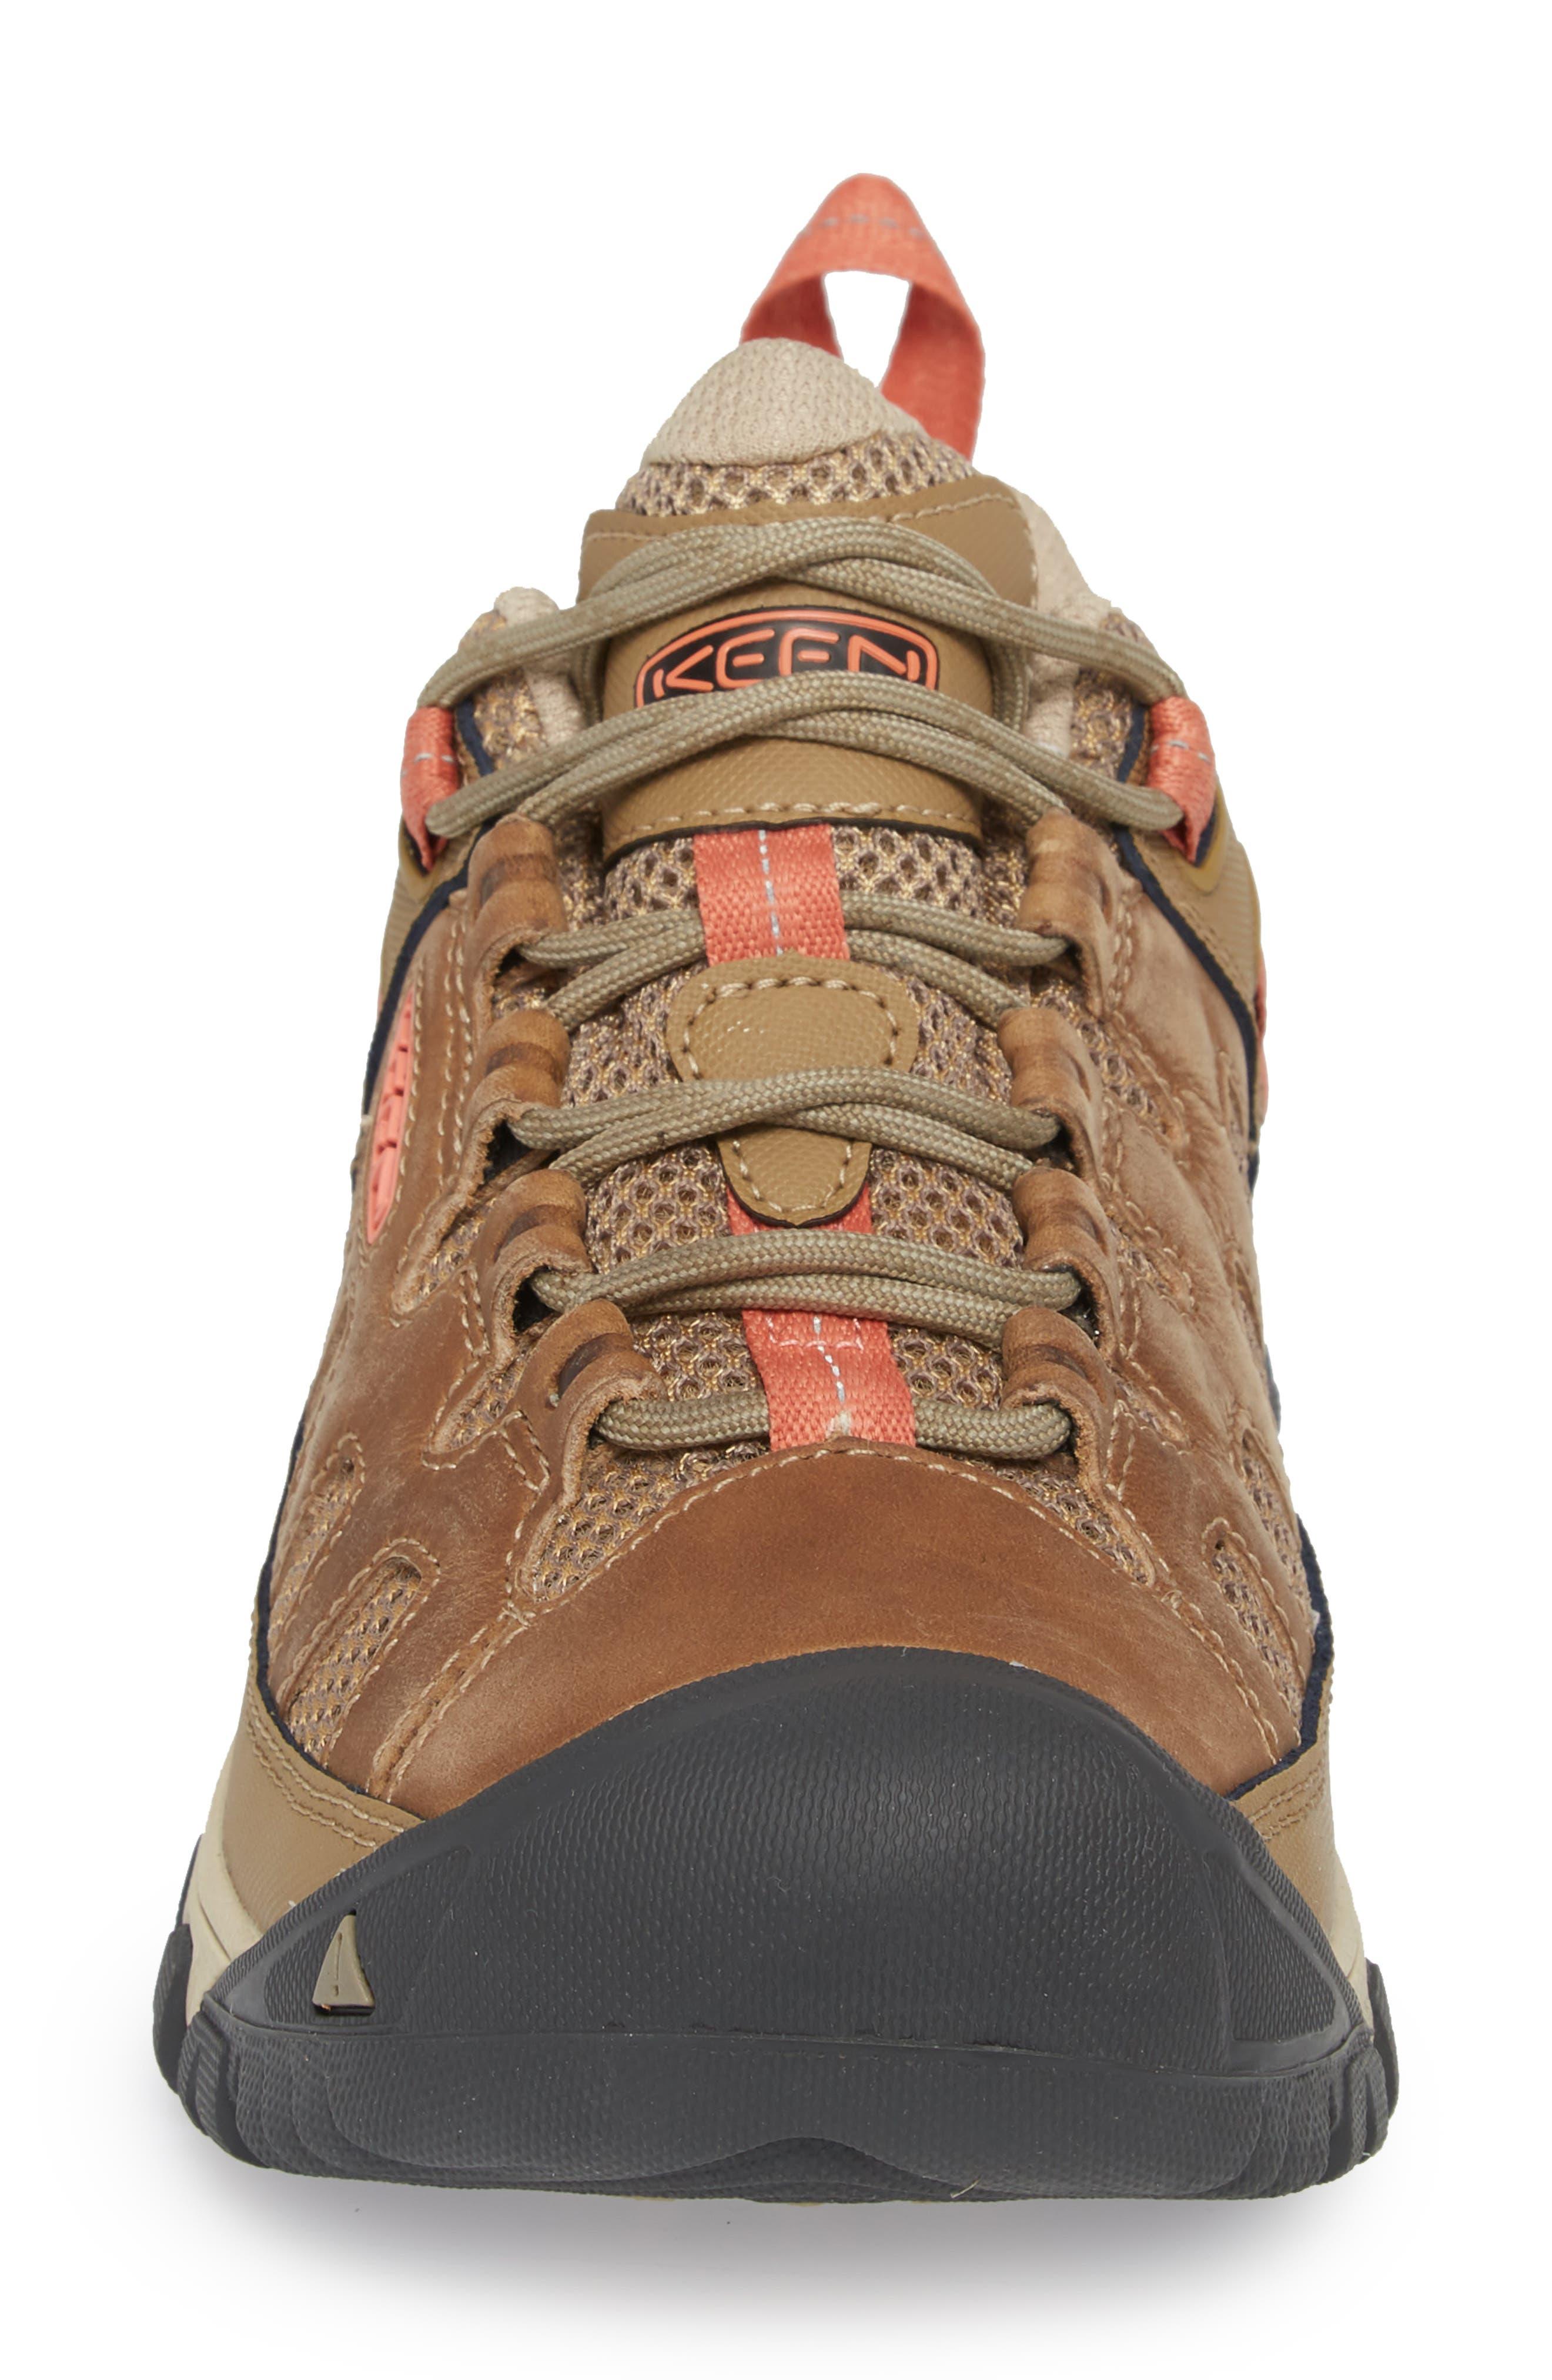 Targhee Vent Hiking Shoe,                             Alternate thumbnail 4, color,                             Sandy/ Cornstalk Leather